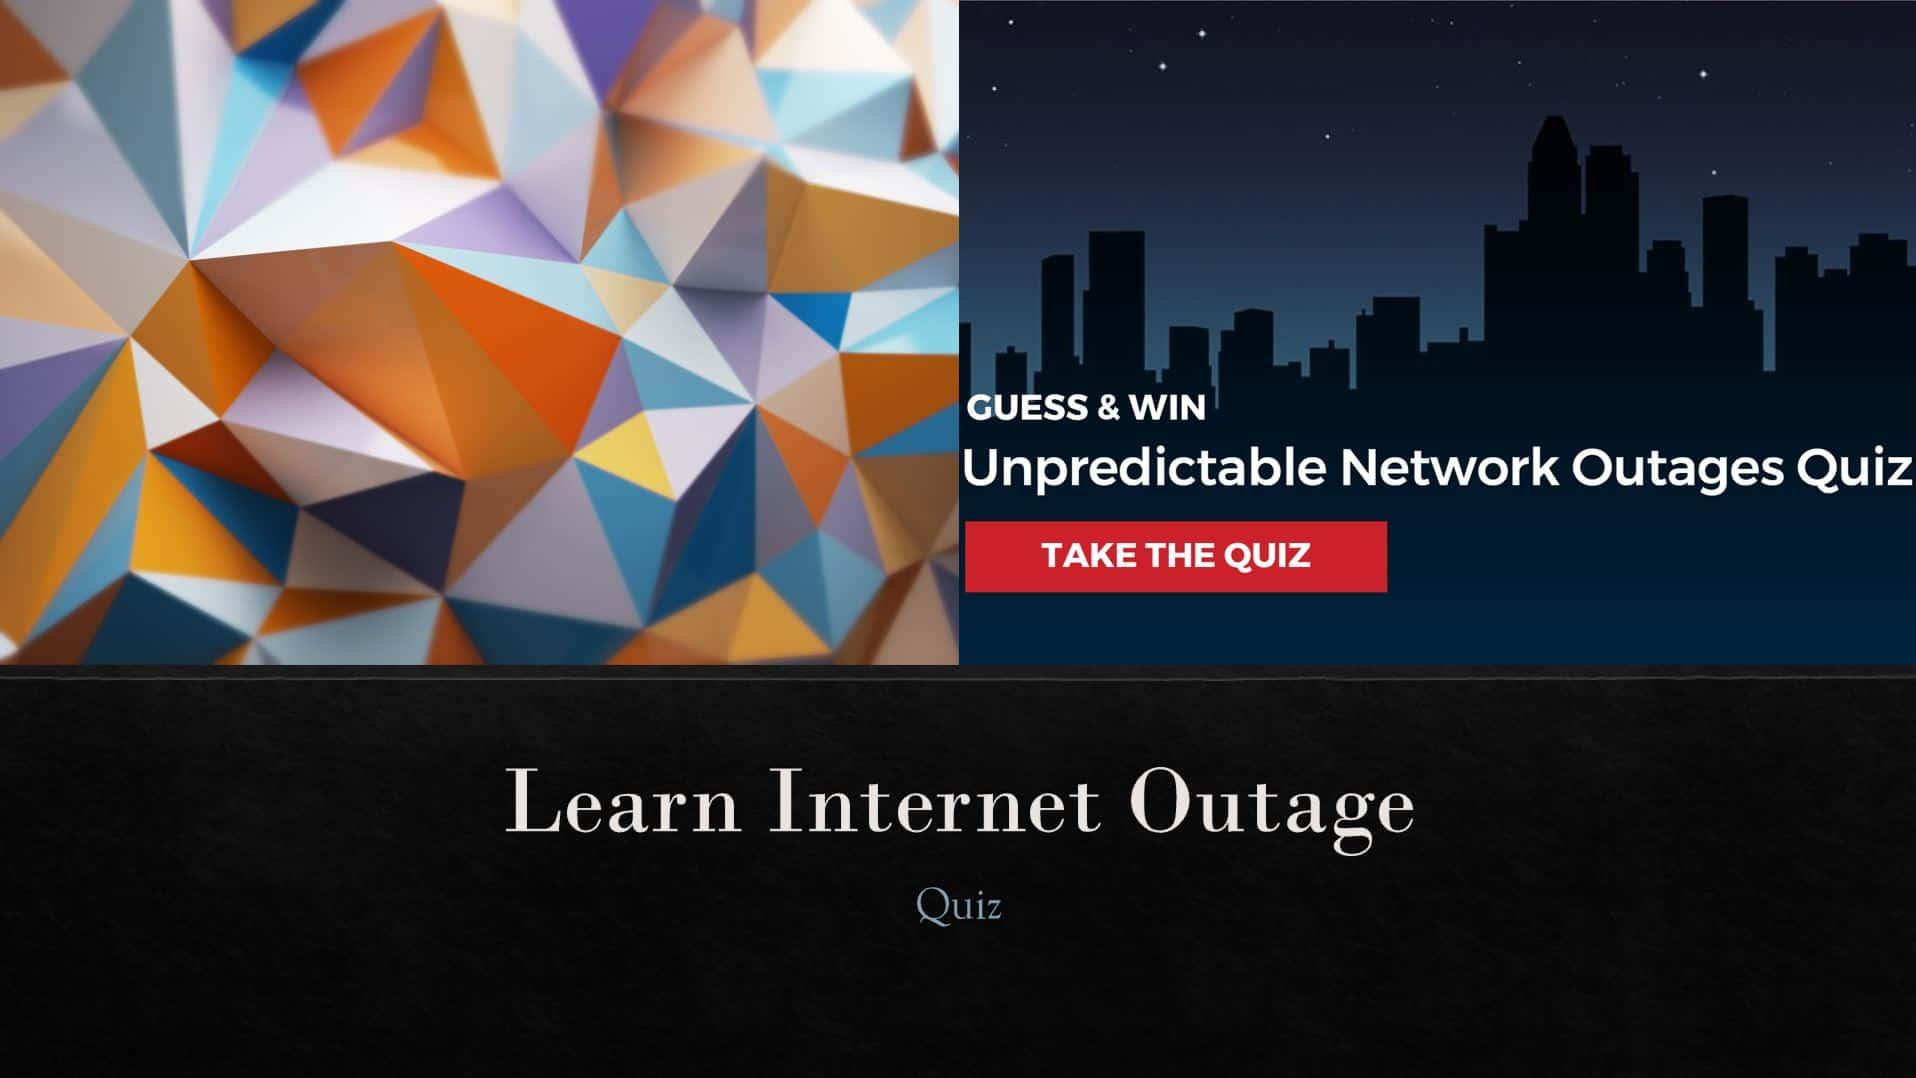 Unpredictable Network Internet Outages Quiz